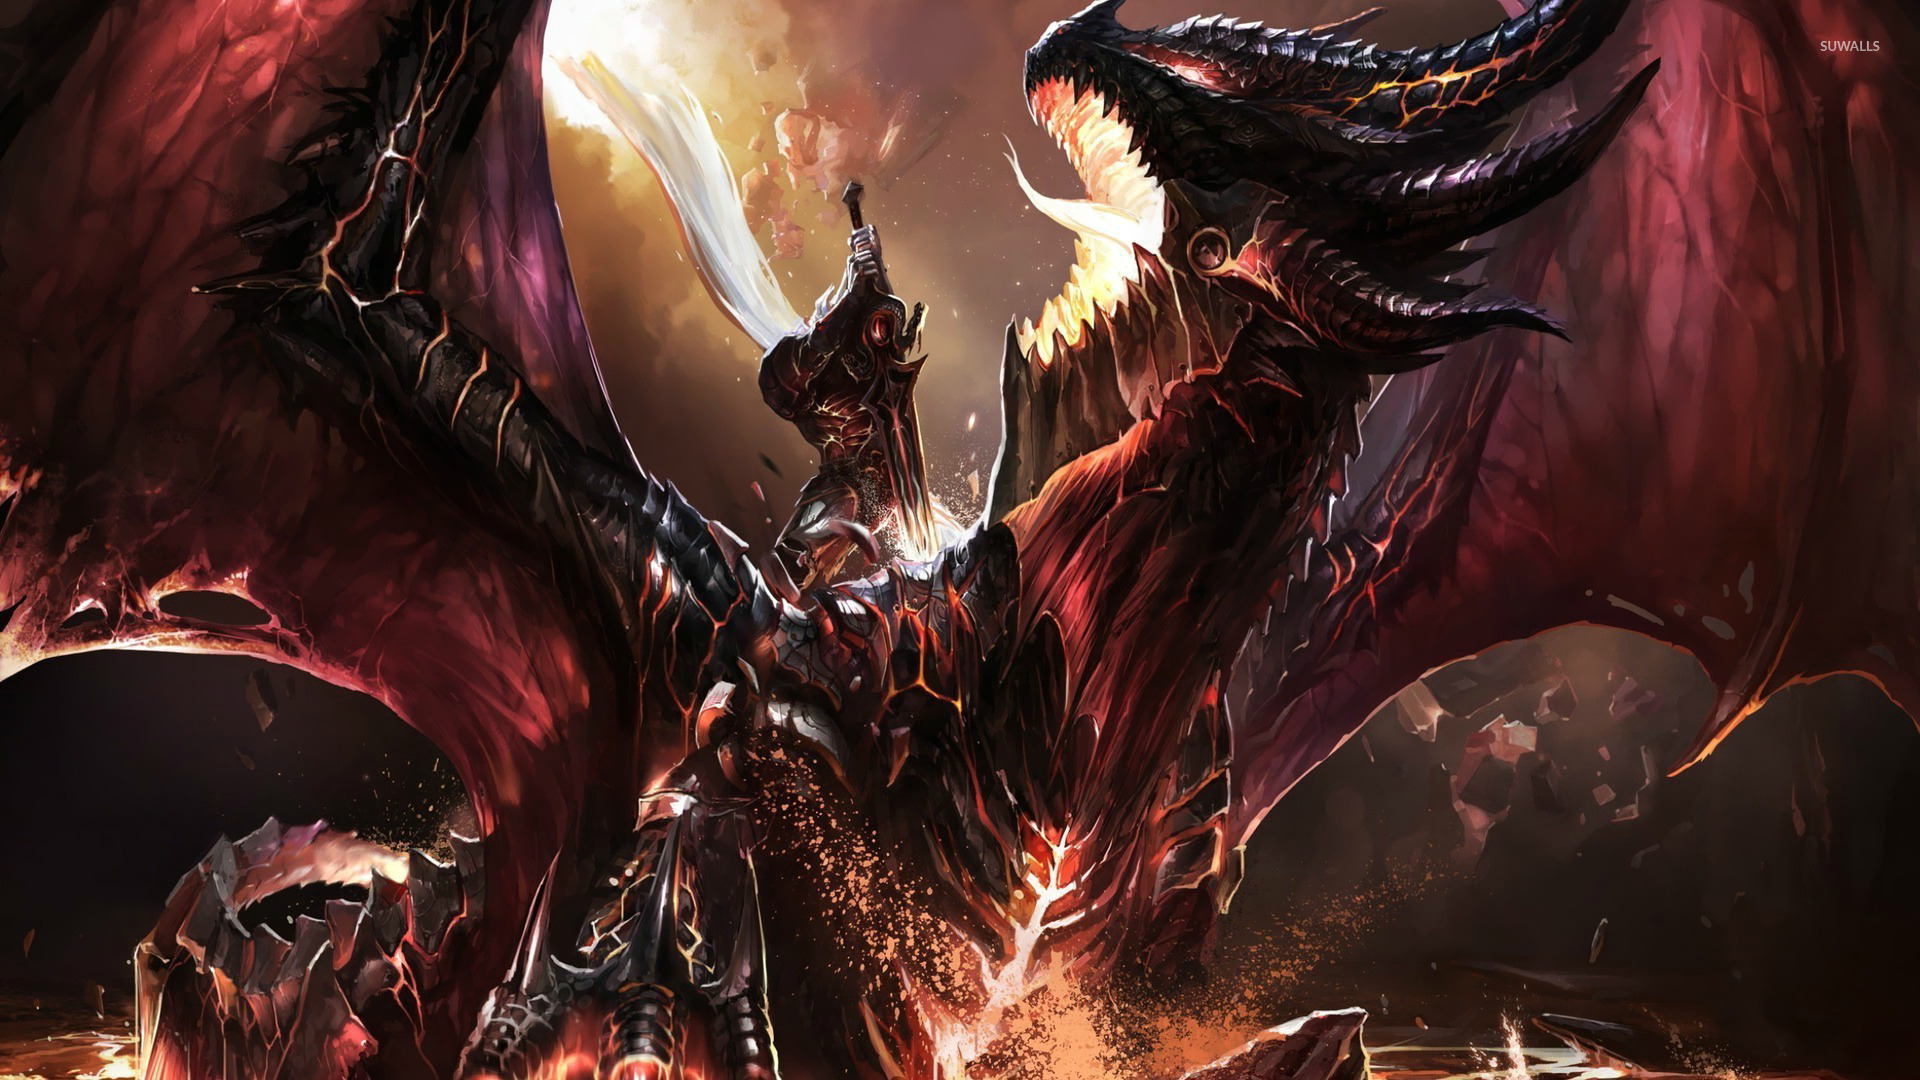 World Of Warcraft Cataclysm 5 Wallpaper Game Wallpapers